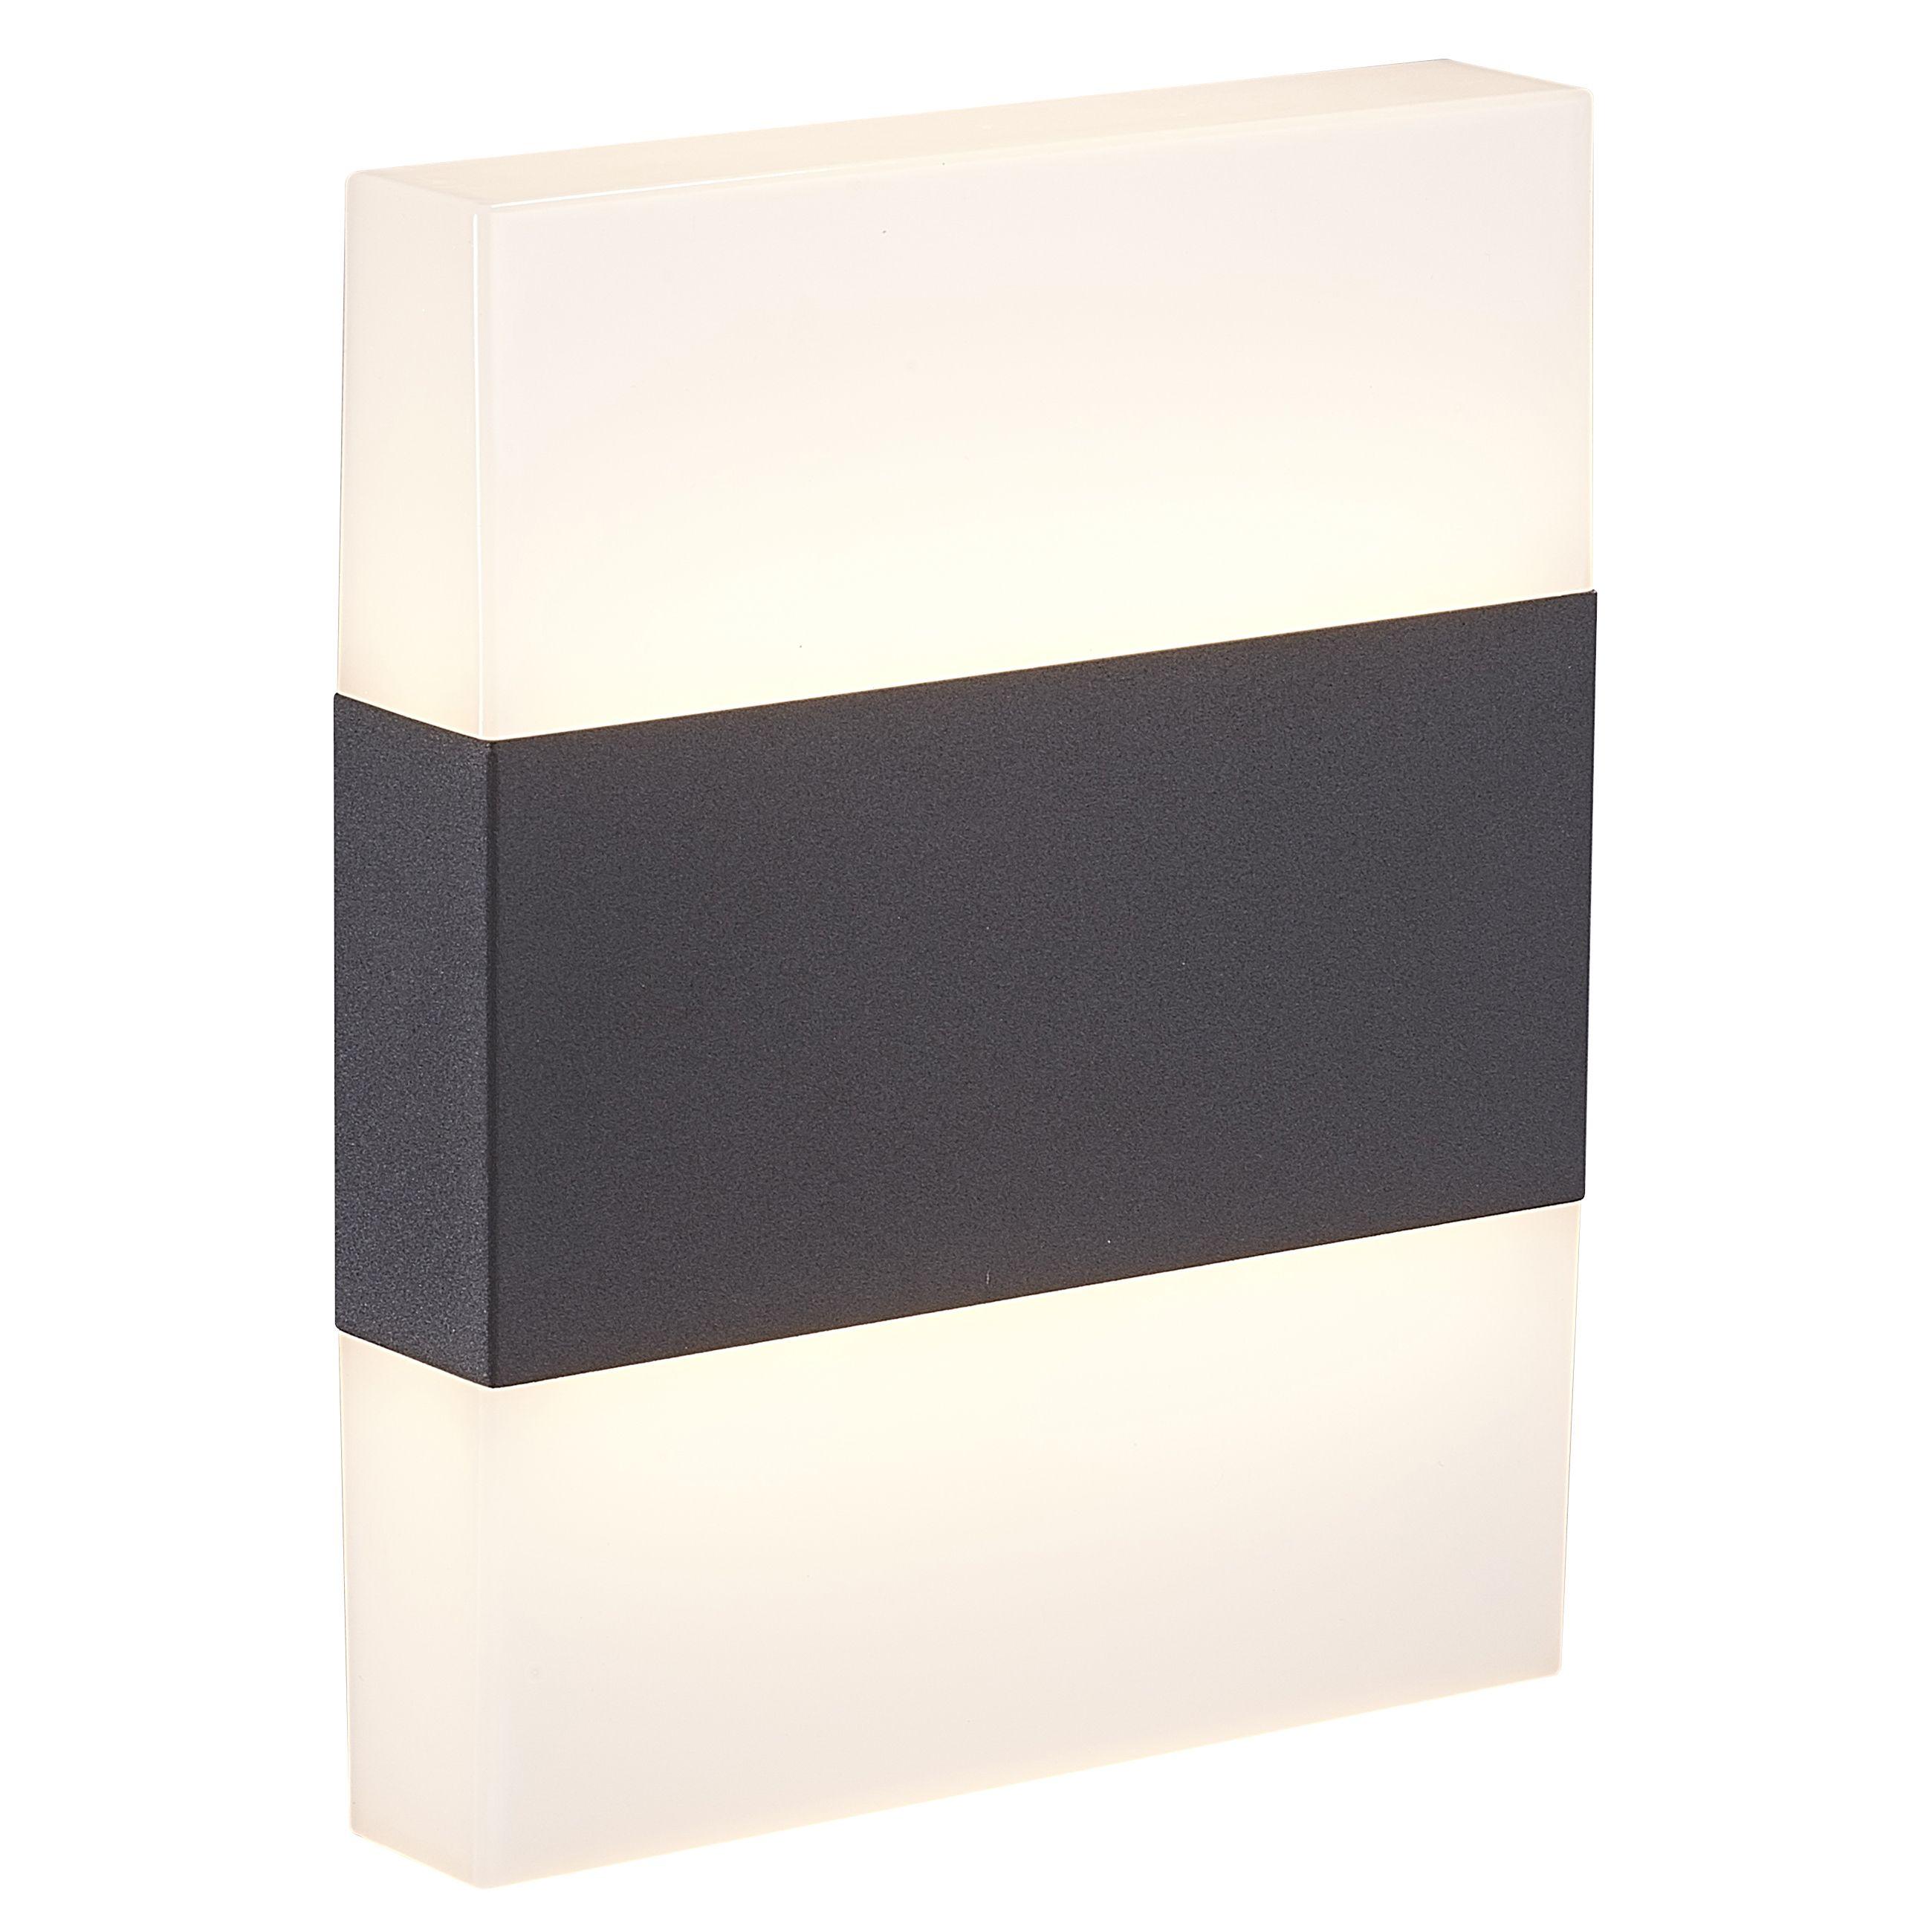 Blooma Graeae Black Mains Powered Rectangular External Wall Light